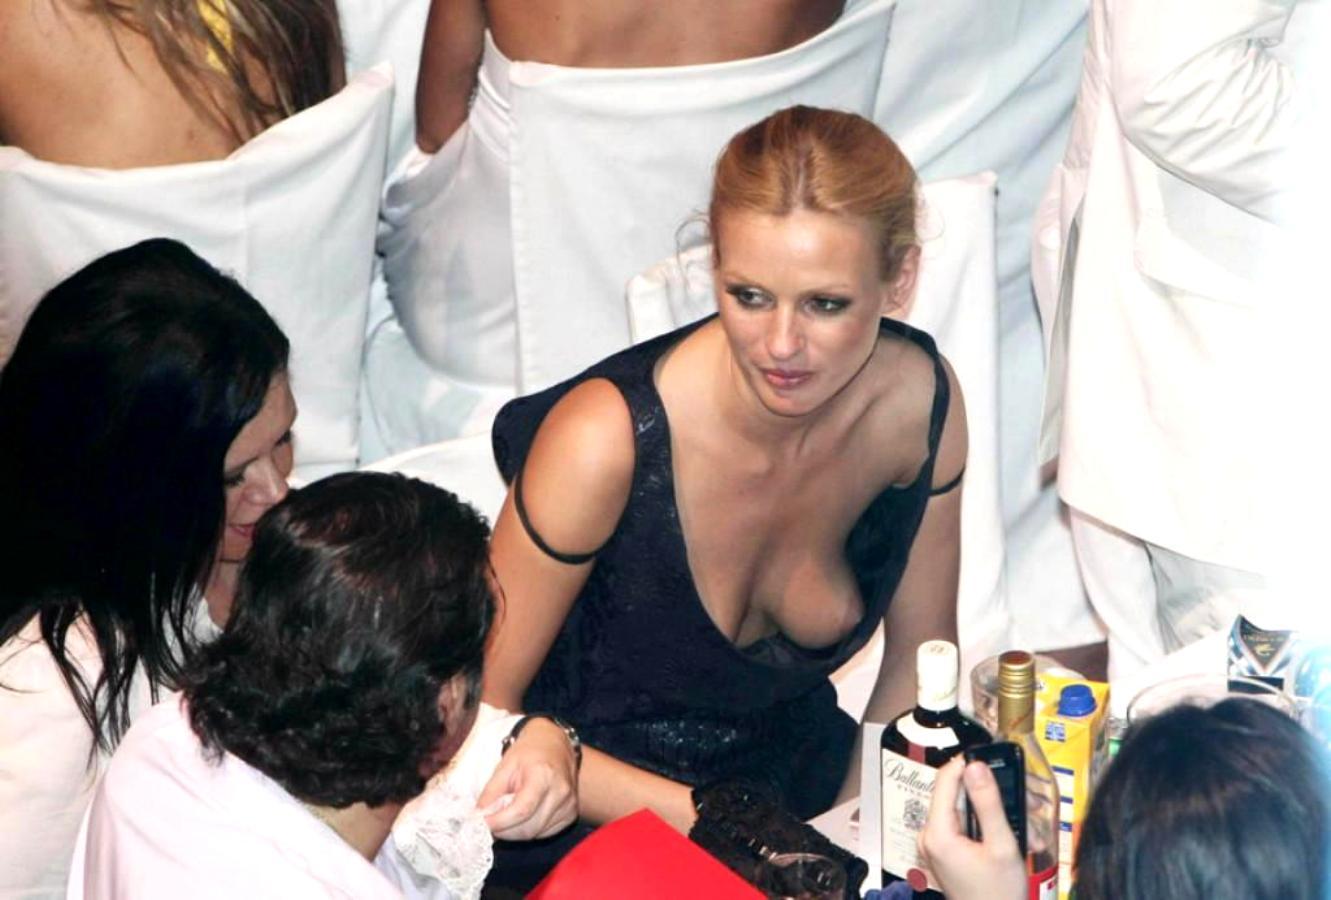 http://1.bp.blogspot.com/-5y65V_XT4r8/T3PBnF4bLOI/AAAAAAAAFMc/wpa1TgVGIFs/s1600/Kate+Bosworth+Downblouse+Nipple+Slip+Candids+www.GutterUncensored.com+003.jpg